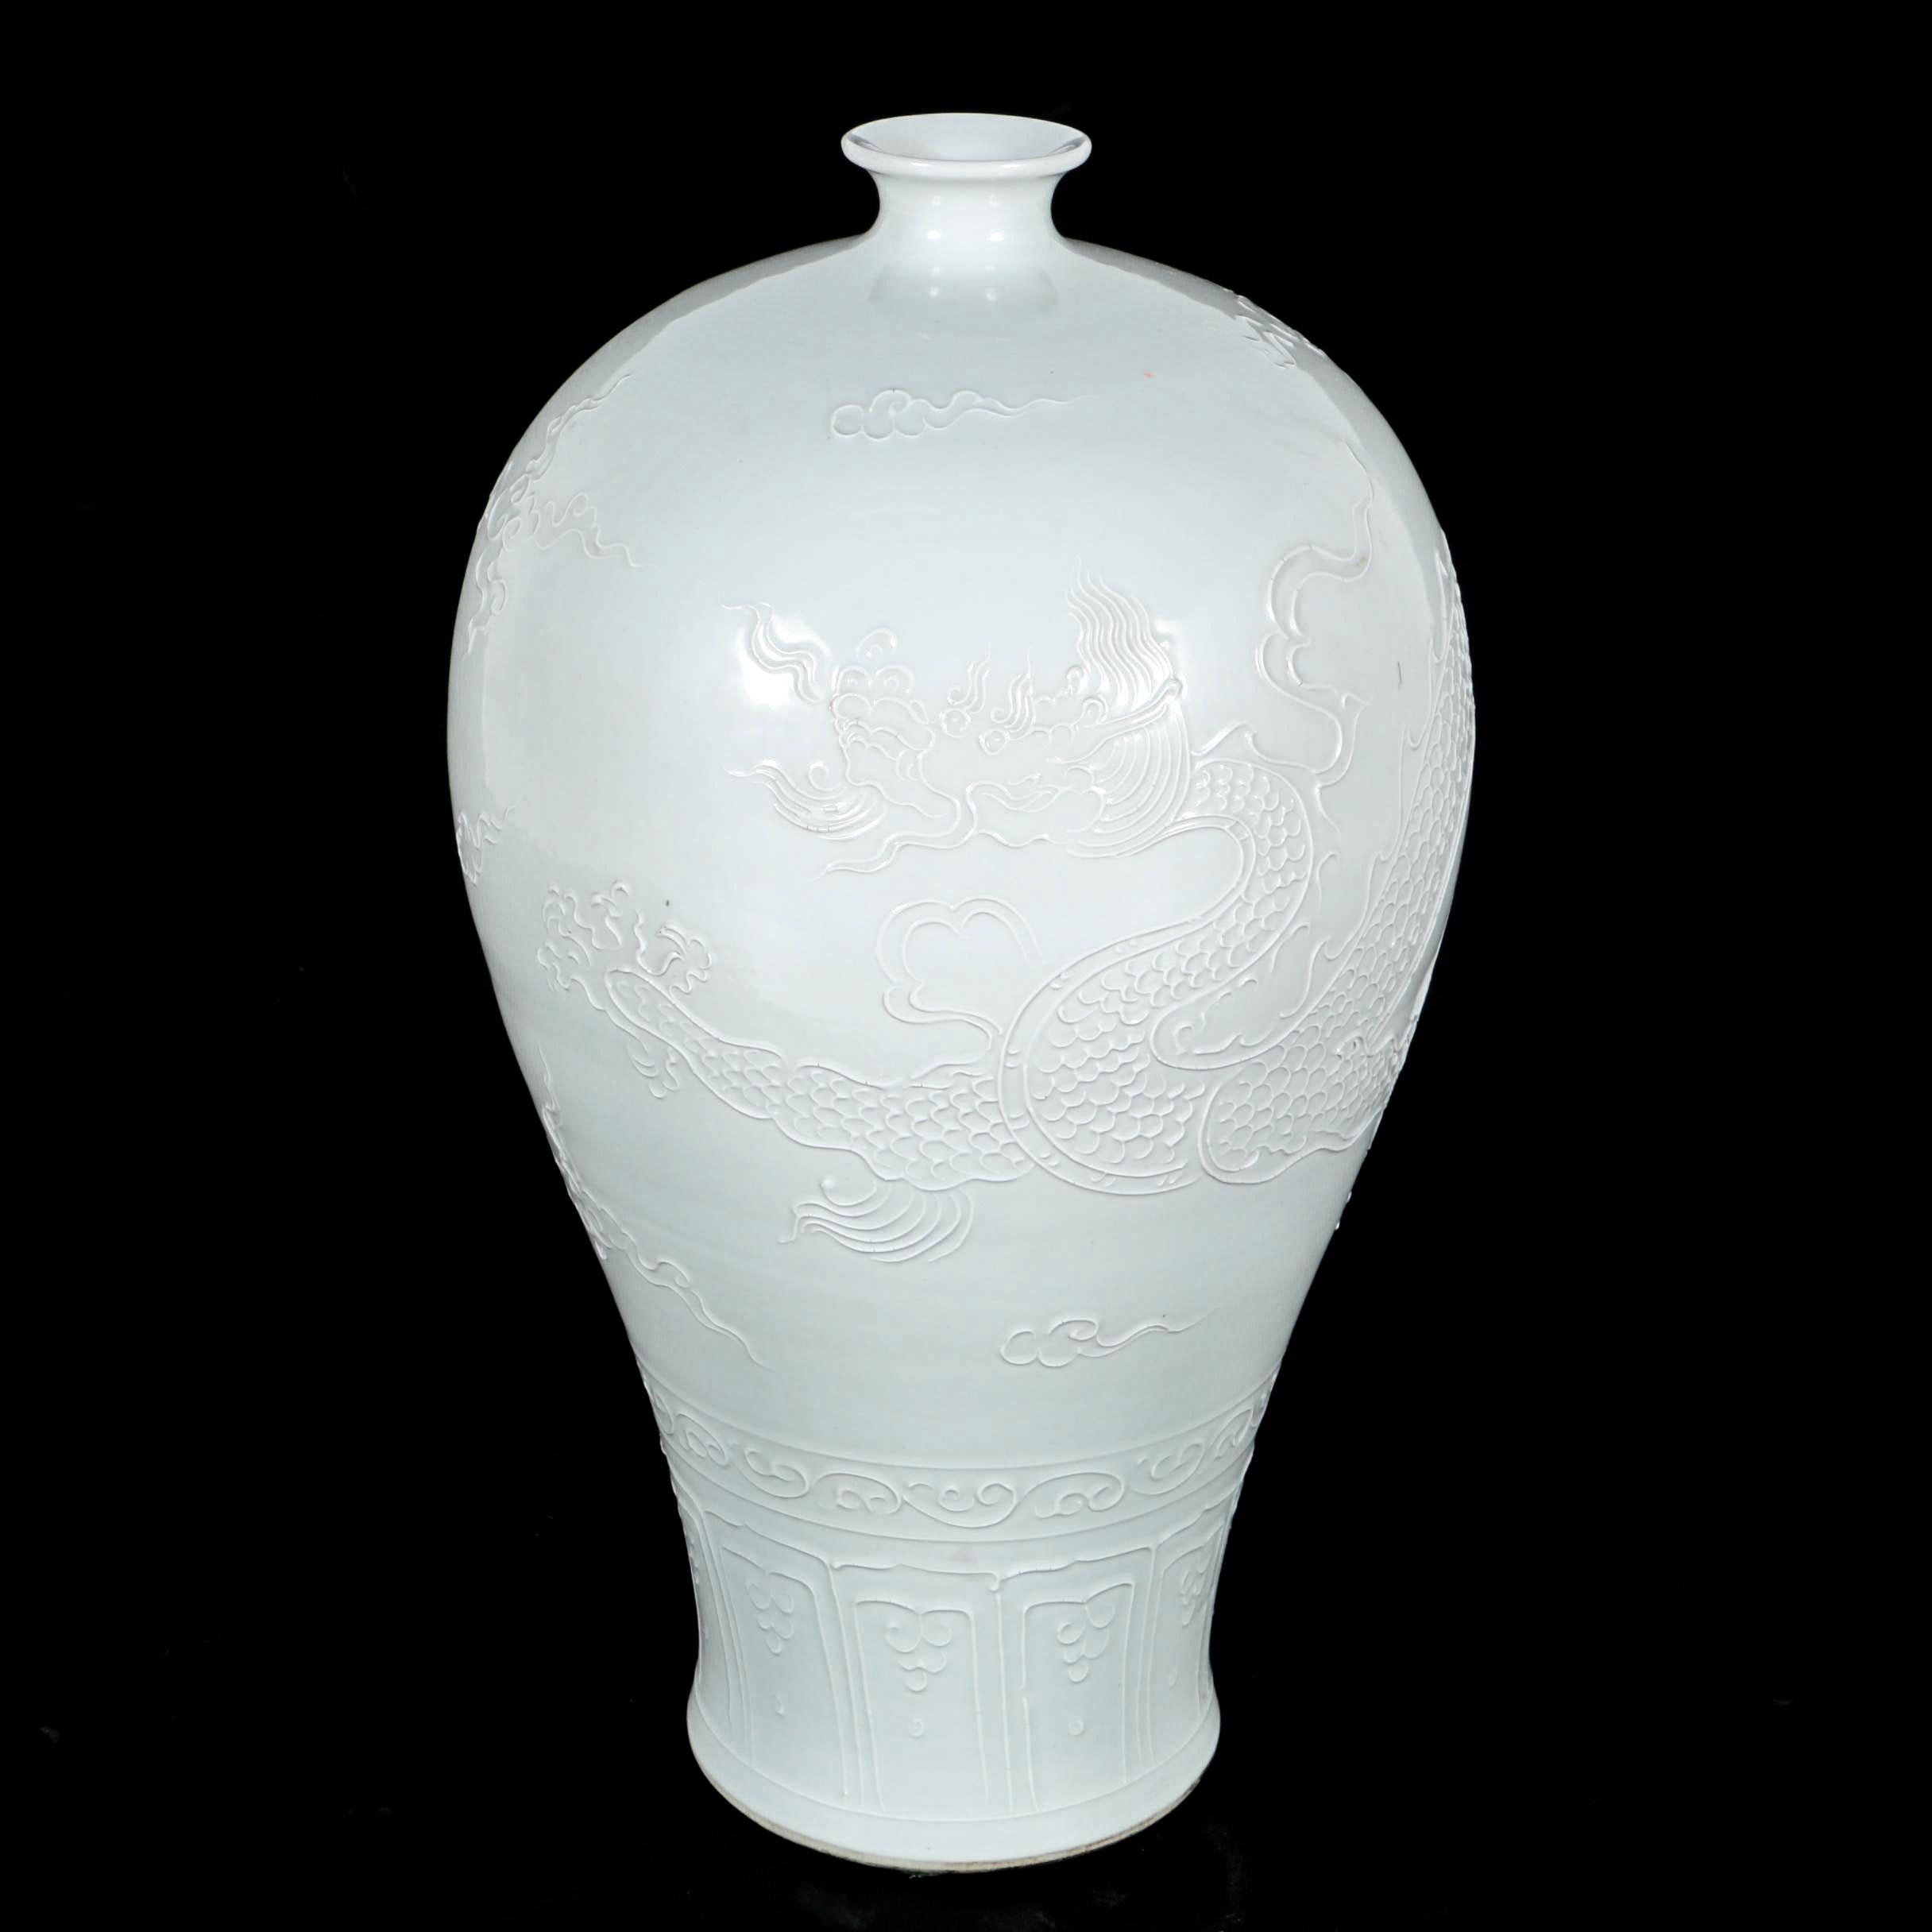 Chinese Dragon Embossed Ceramic Vase